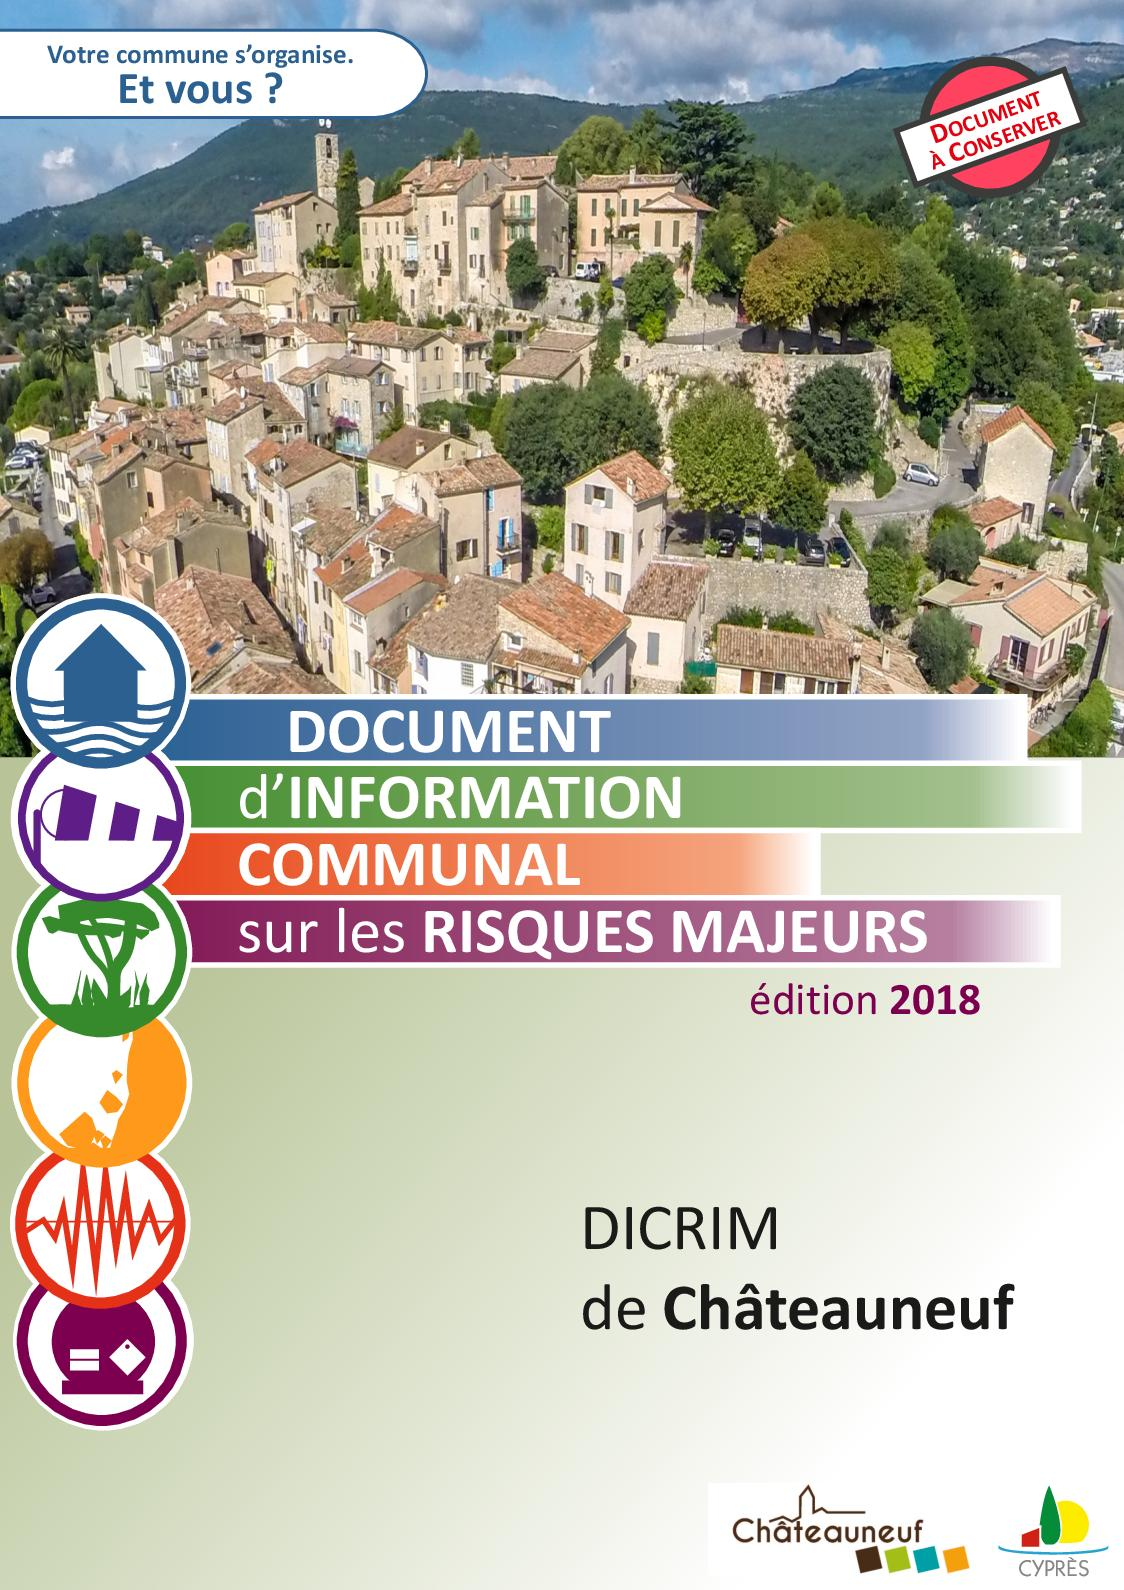 Calaméo - DICRIM de Châteauneuf-Grasse (06) eb8cae85b5ff